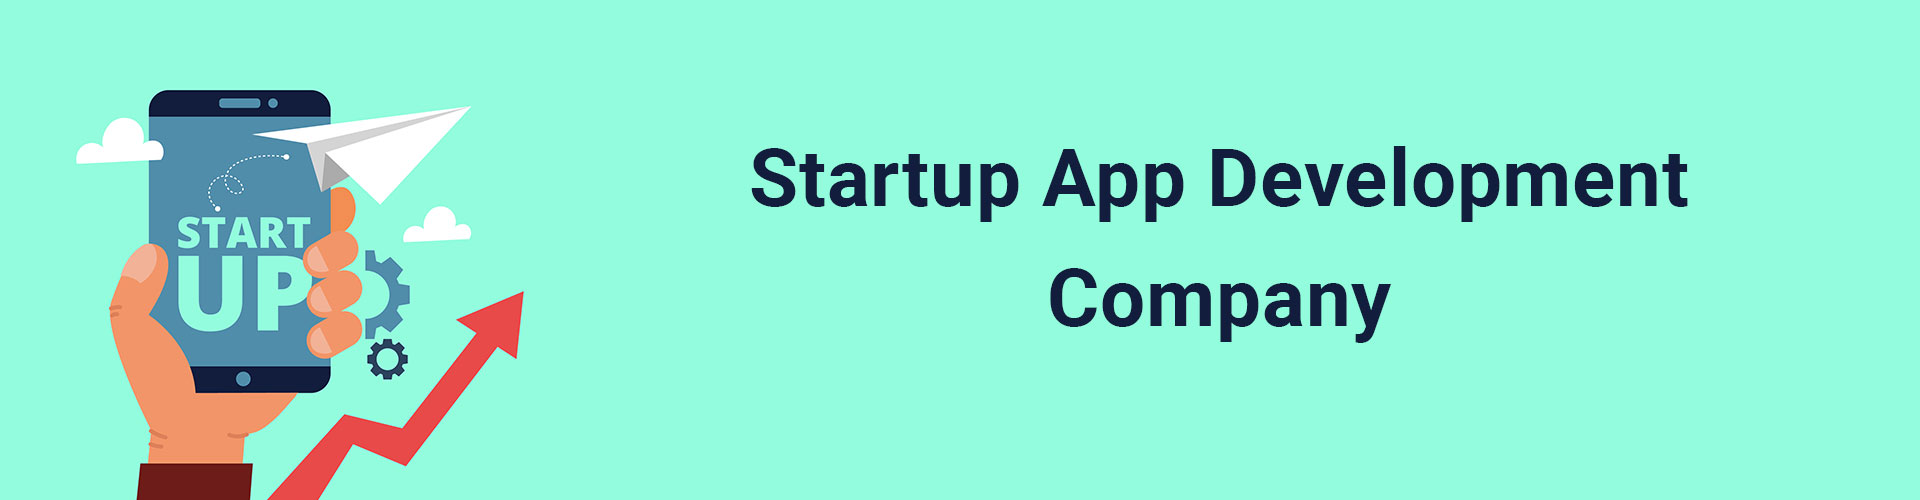 startup app development company